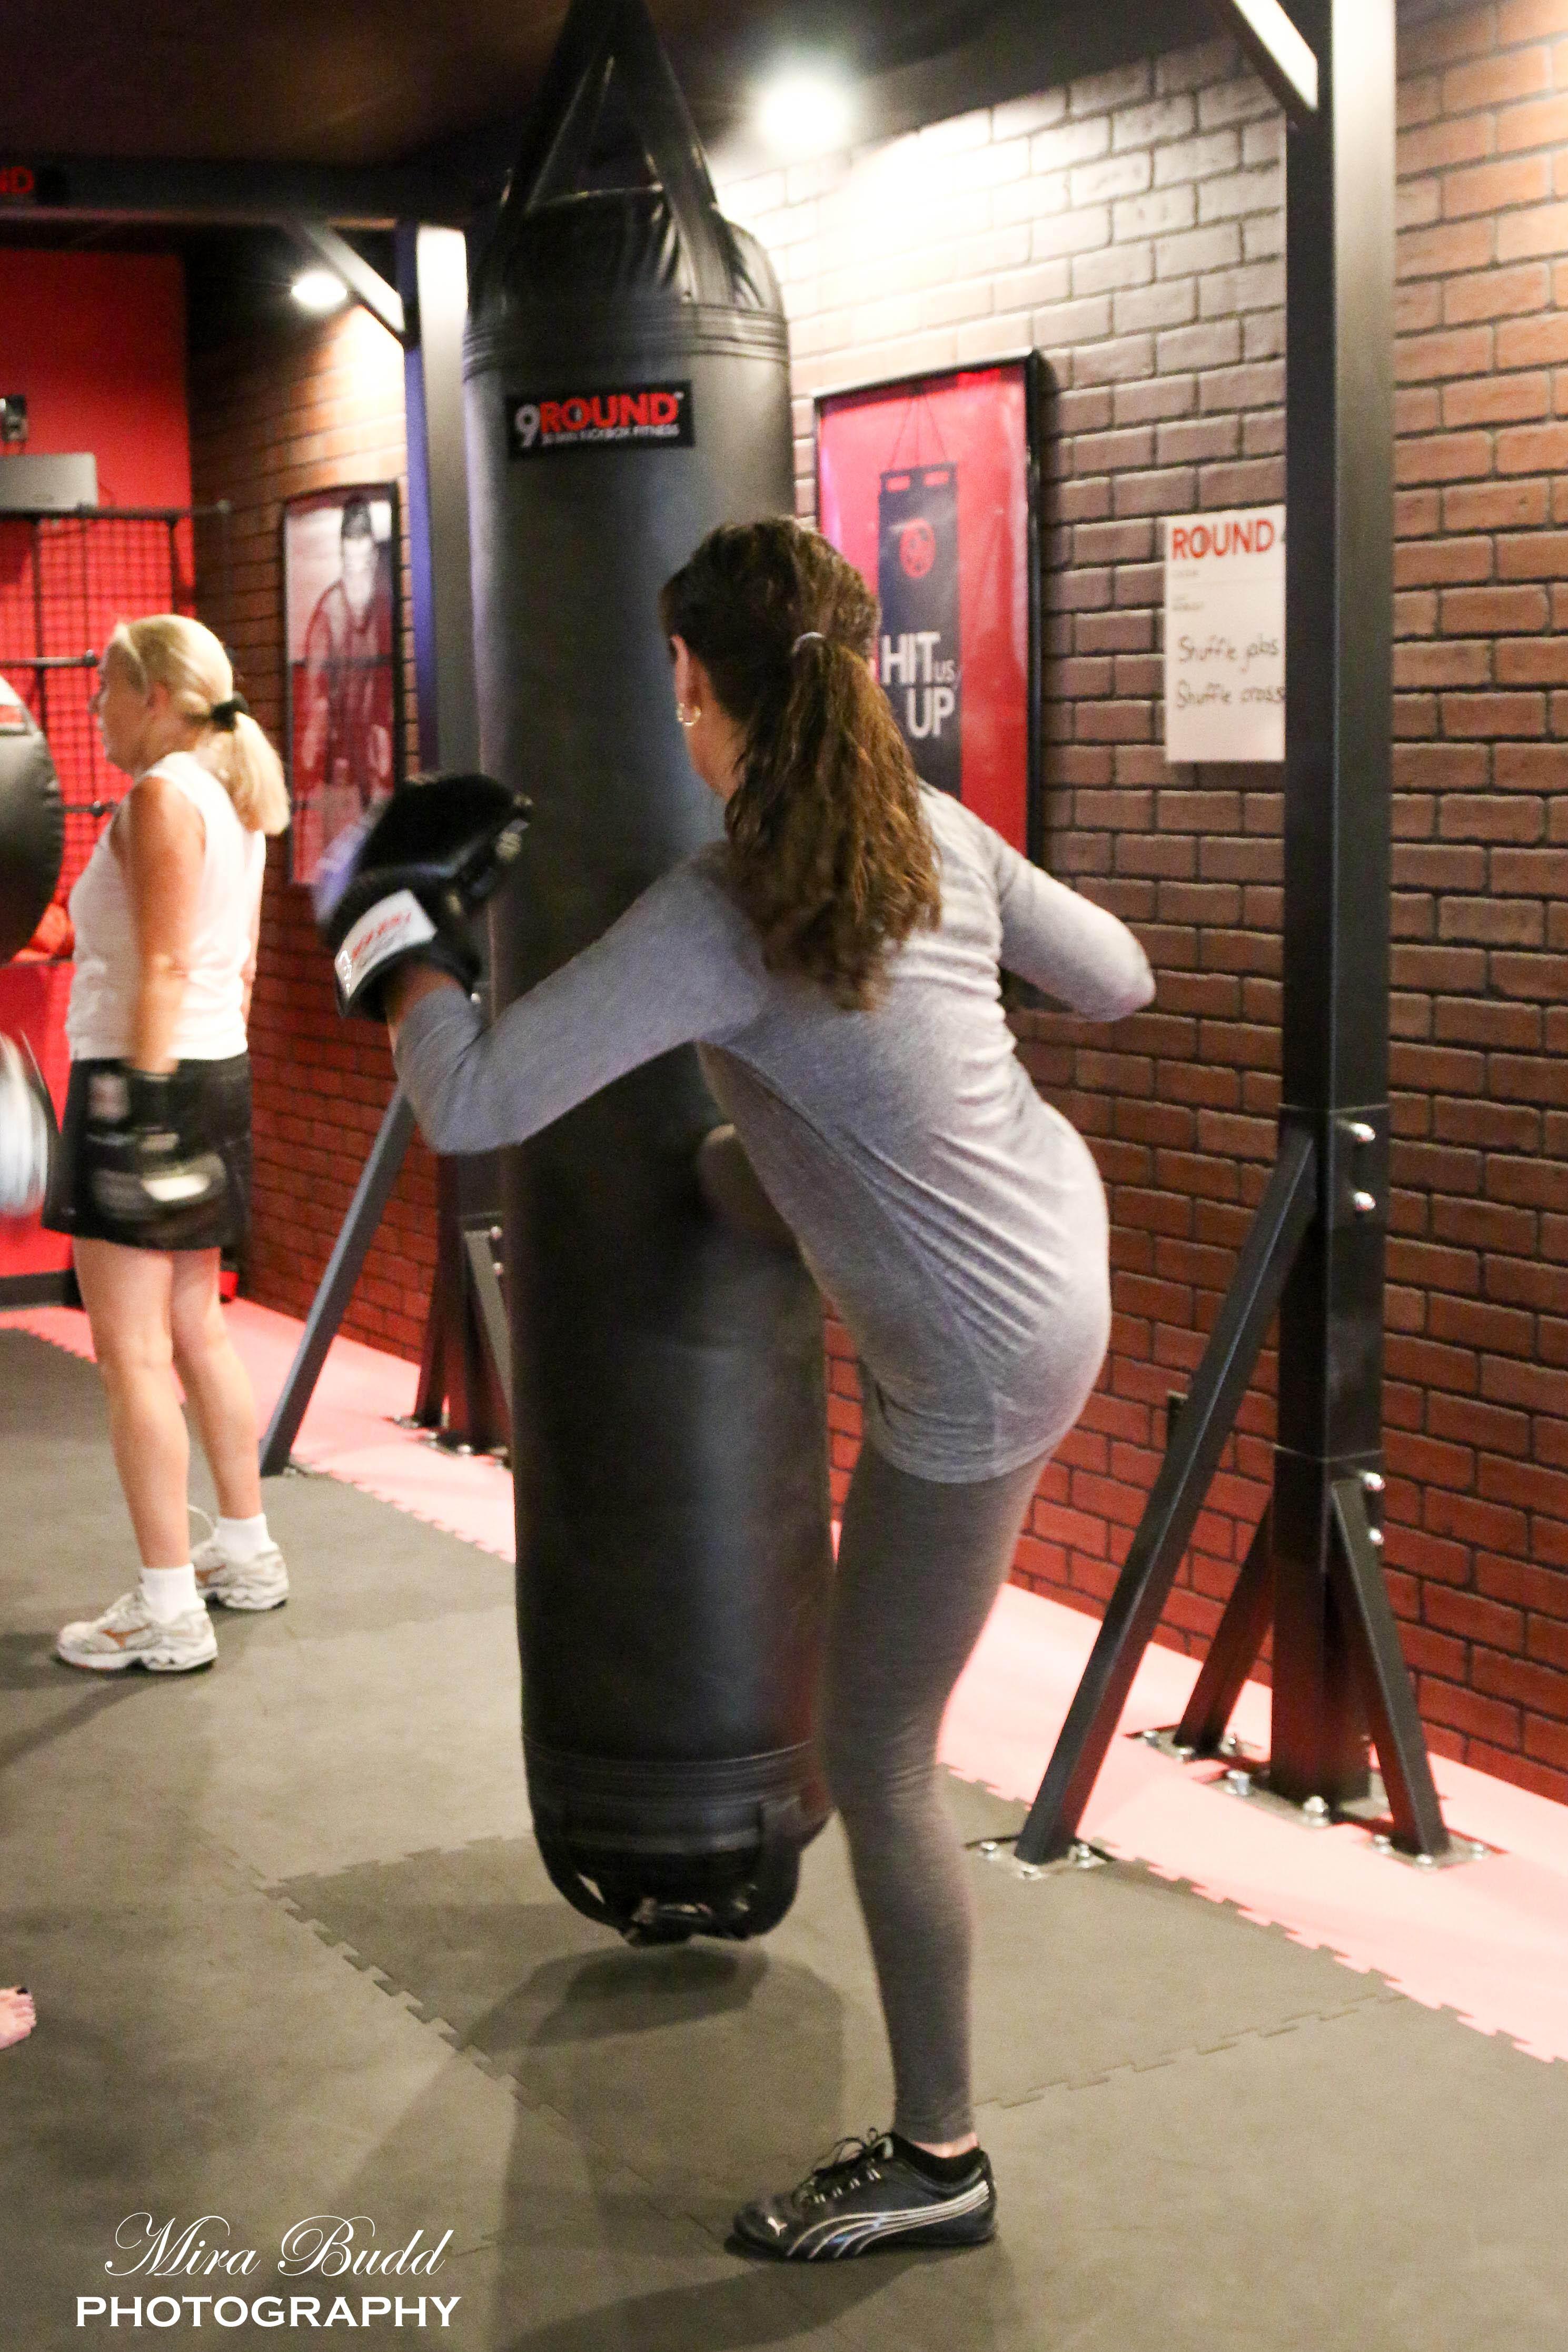 Kickboxing Body Workout Img Copy